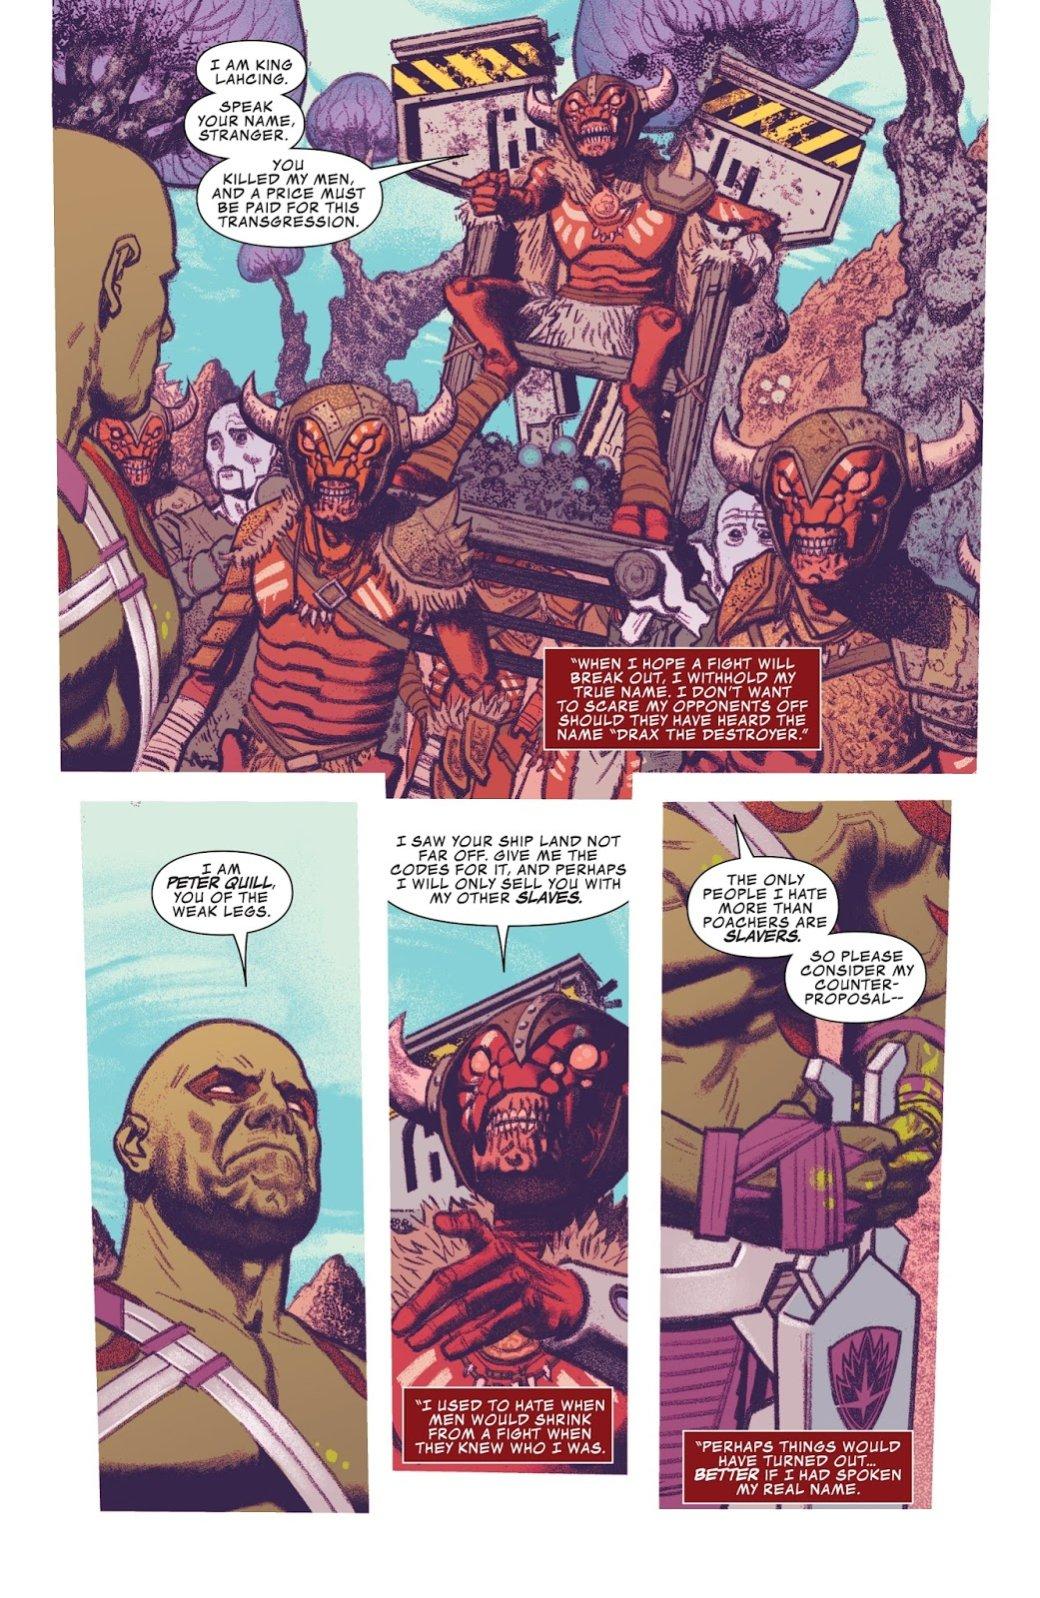 Открытия 2017— комиксы: Star-Lord, Infamous Iron Man, Batman: The White Knight. - Изображение 5